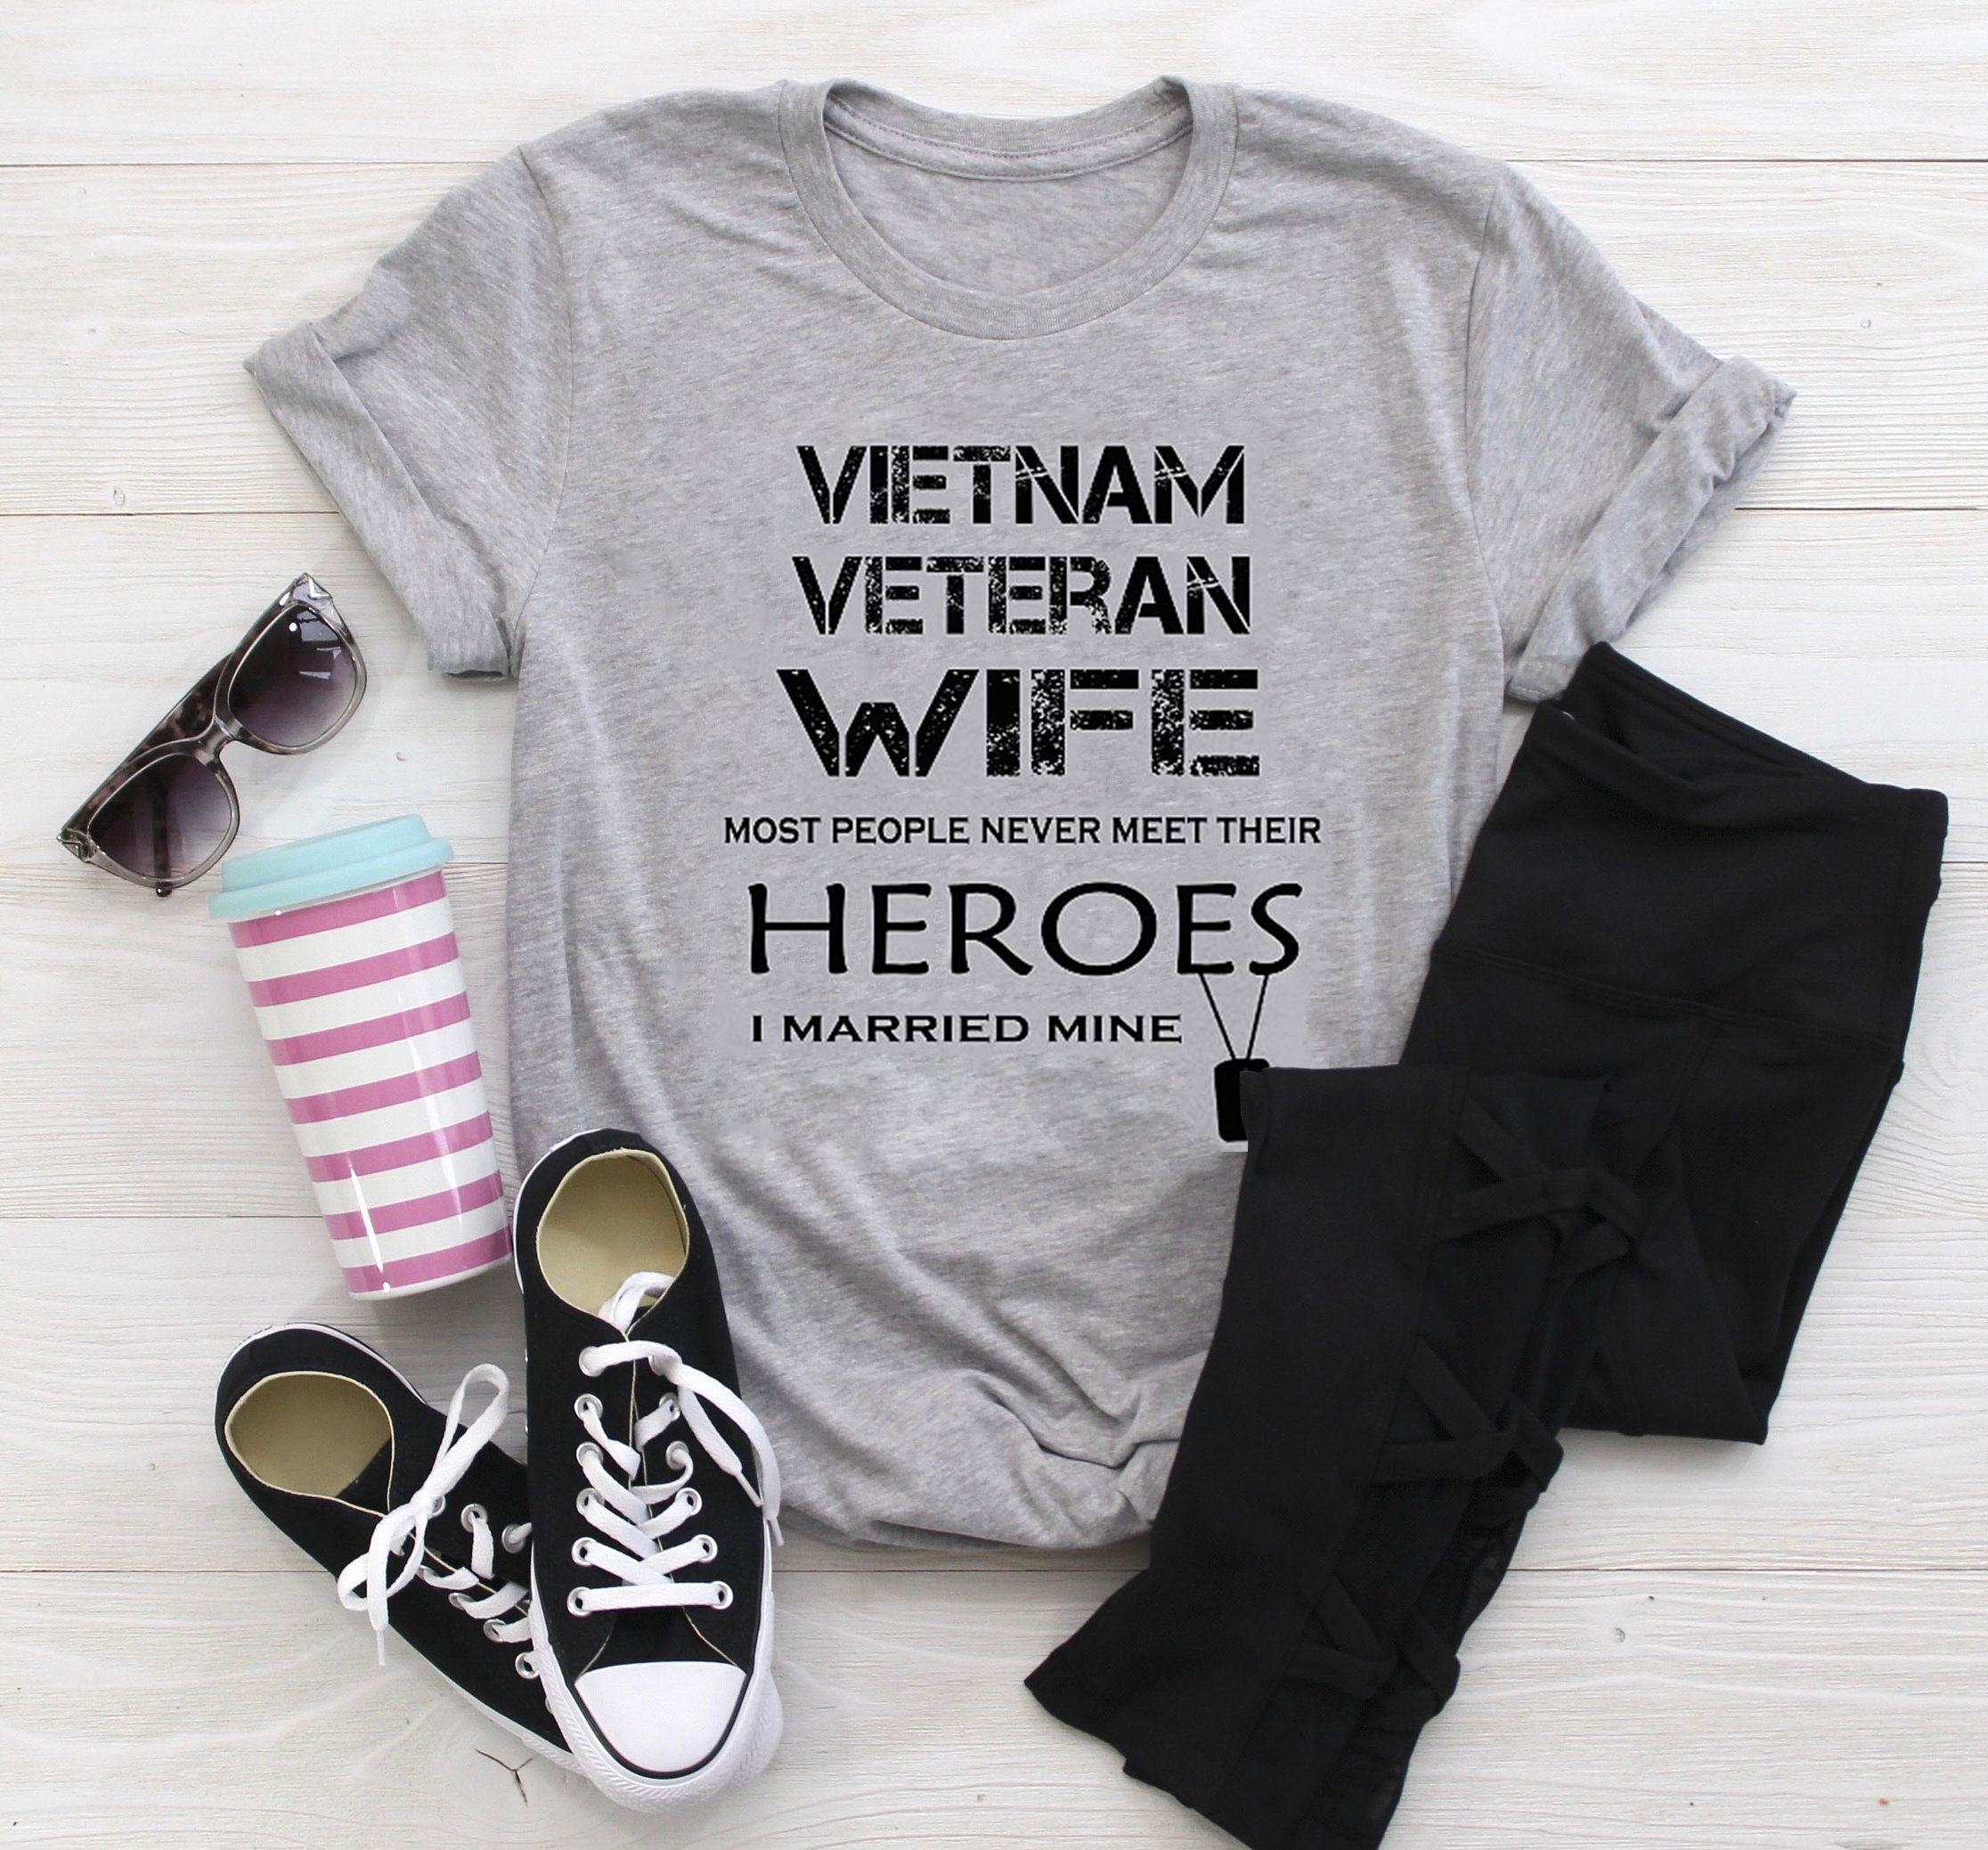 Vietnam Veteran Wife Shirt Most People Never Meet Their Hero